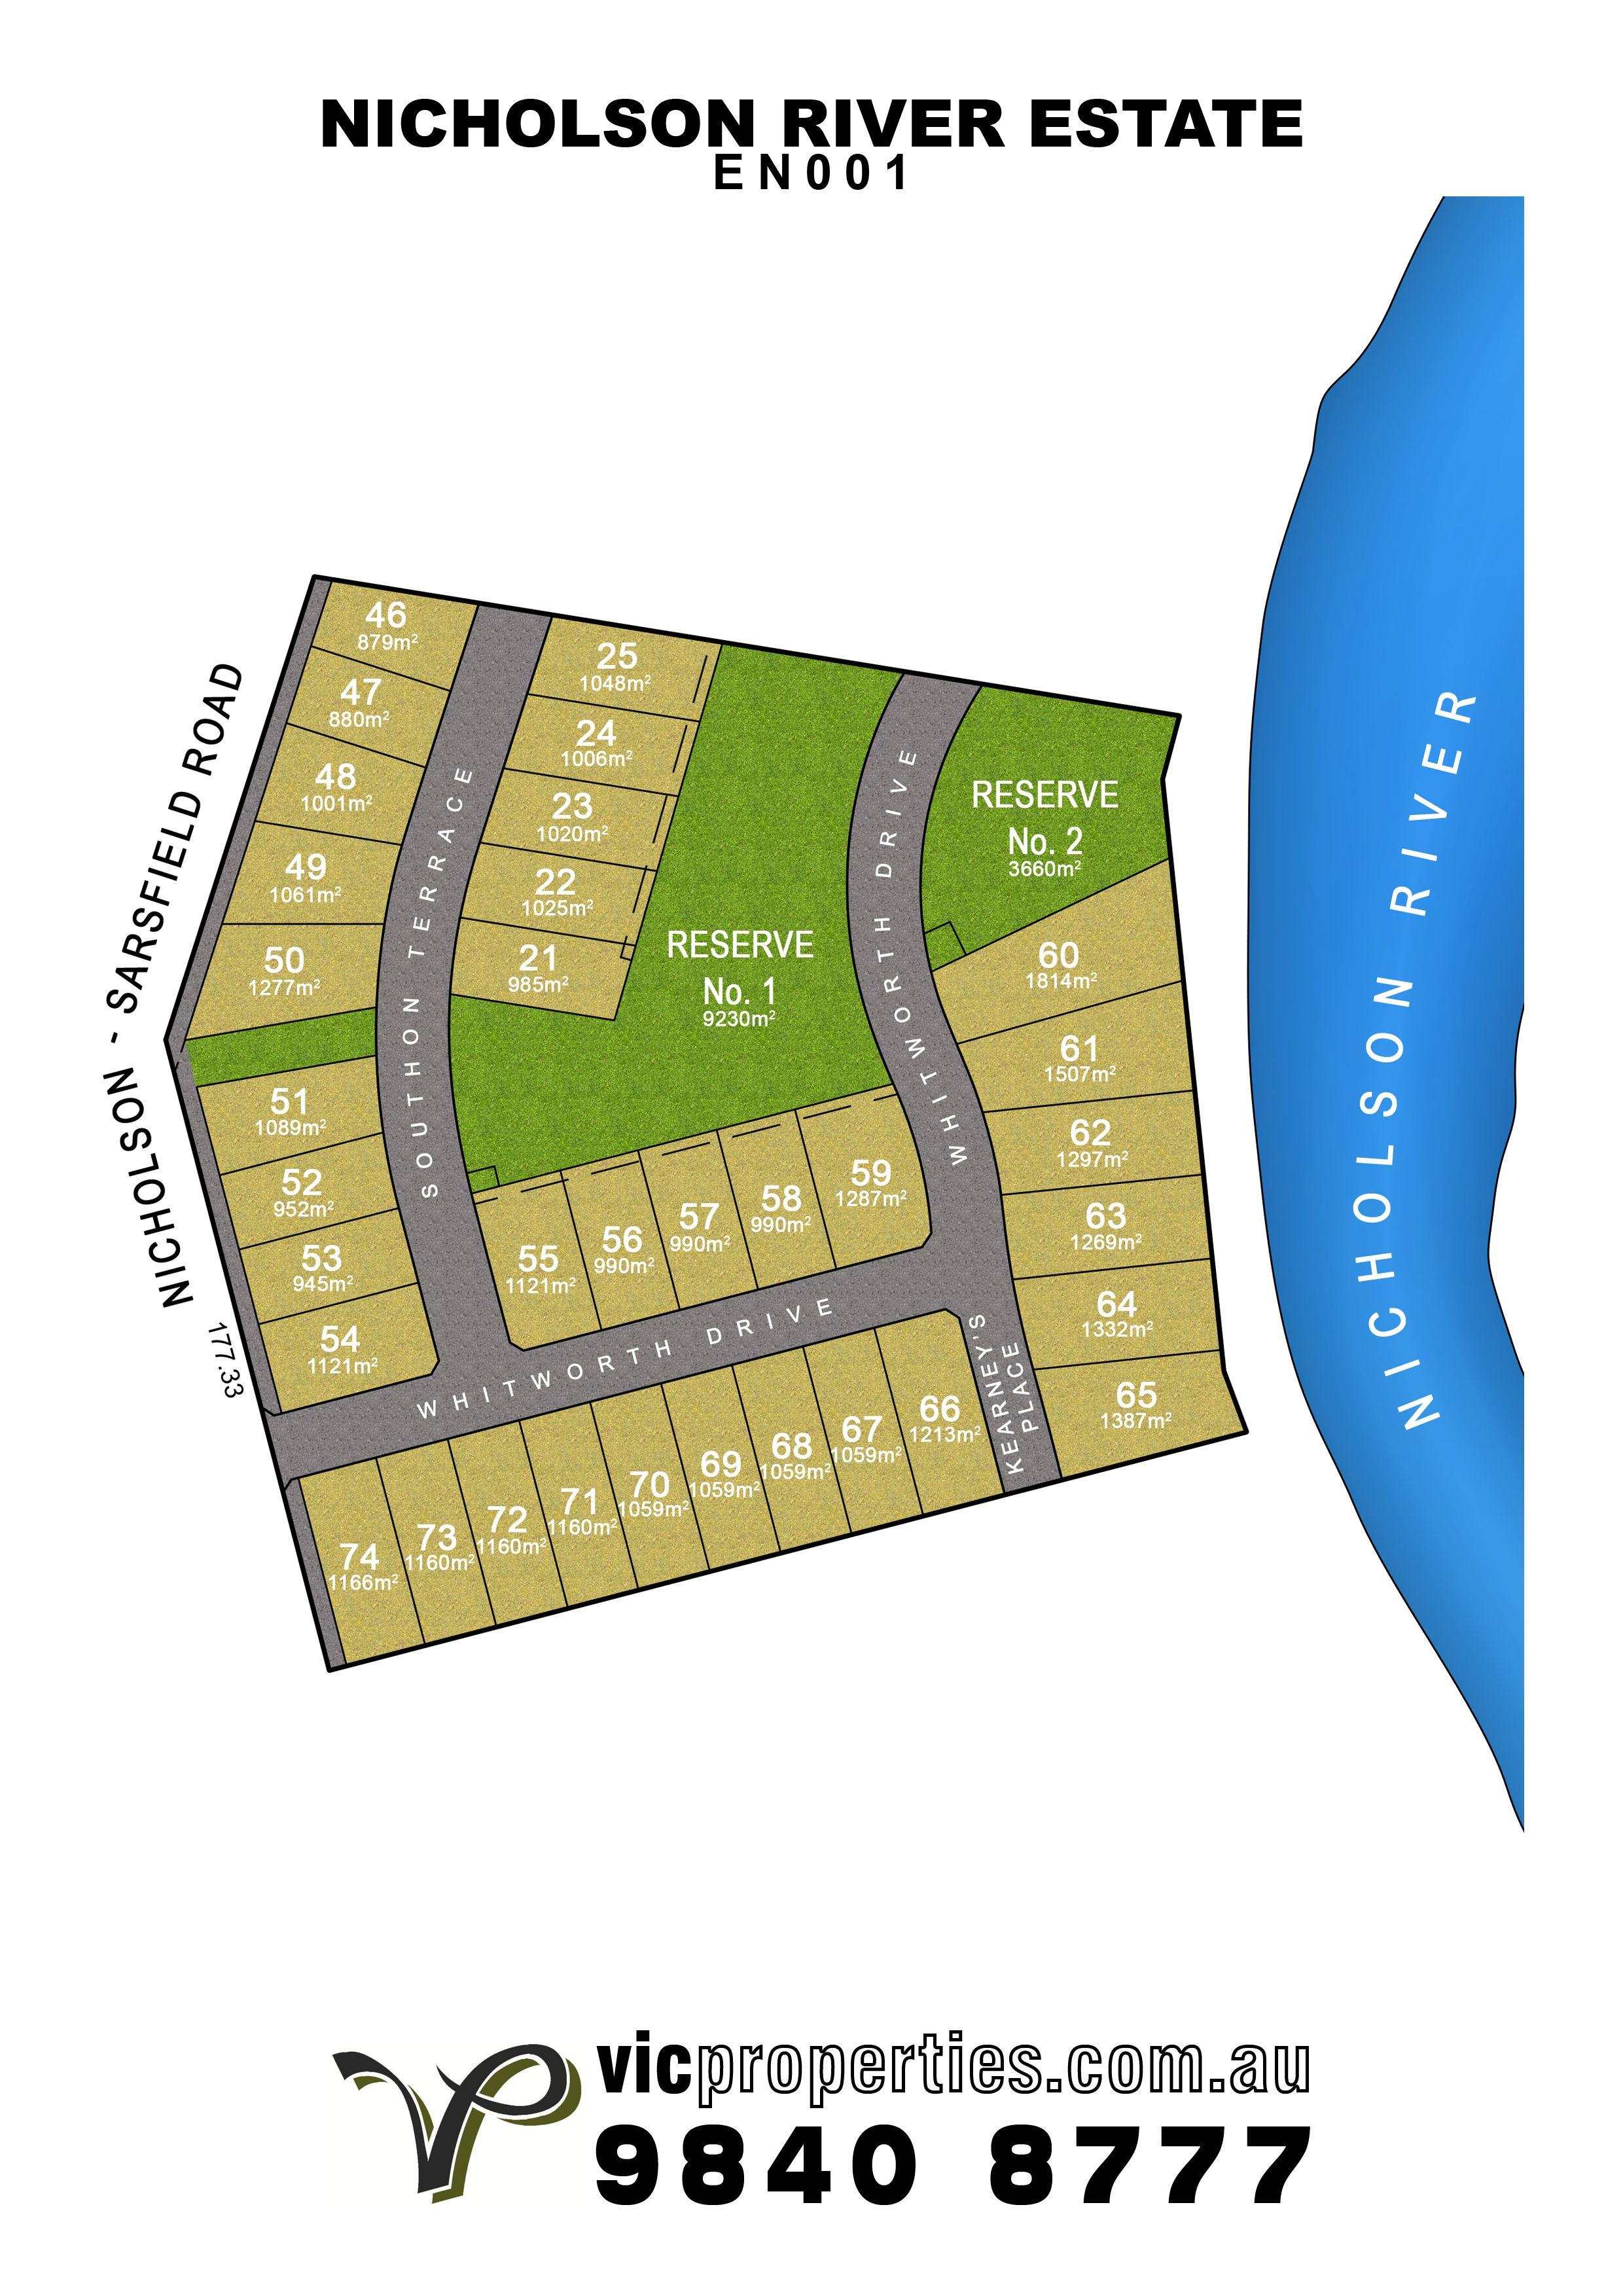 Lot 58/15 Whitworth Drive, Nicholson VIC 3882